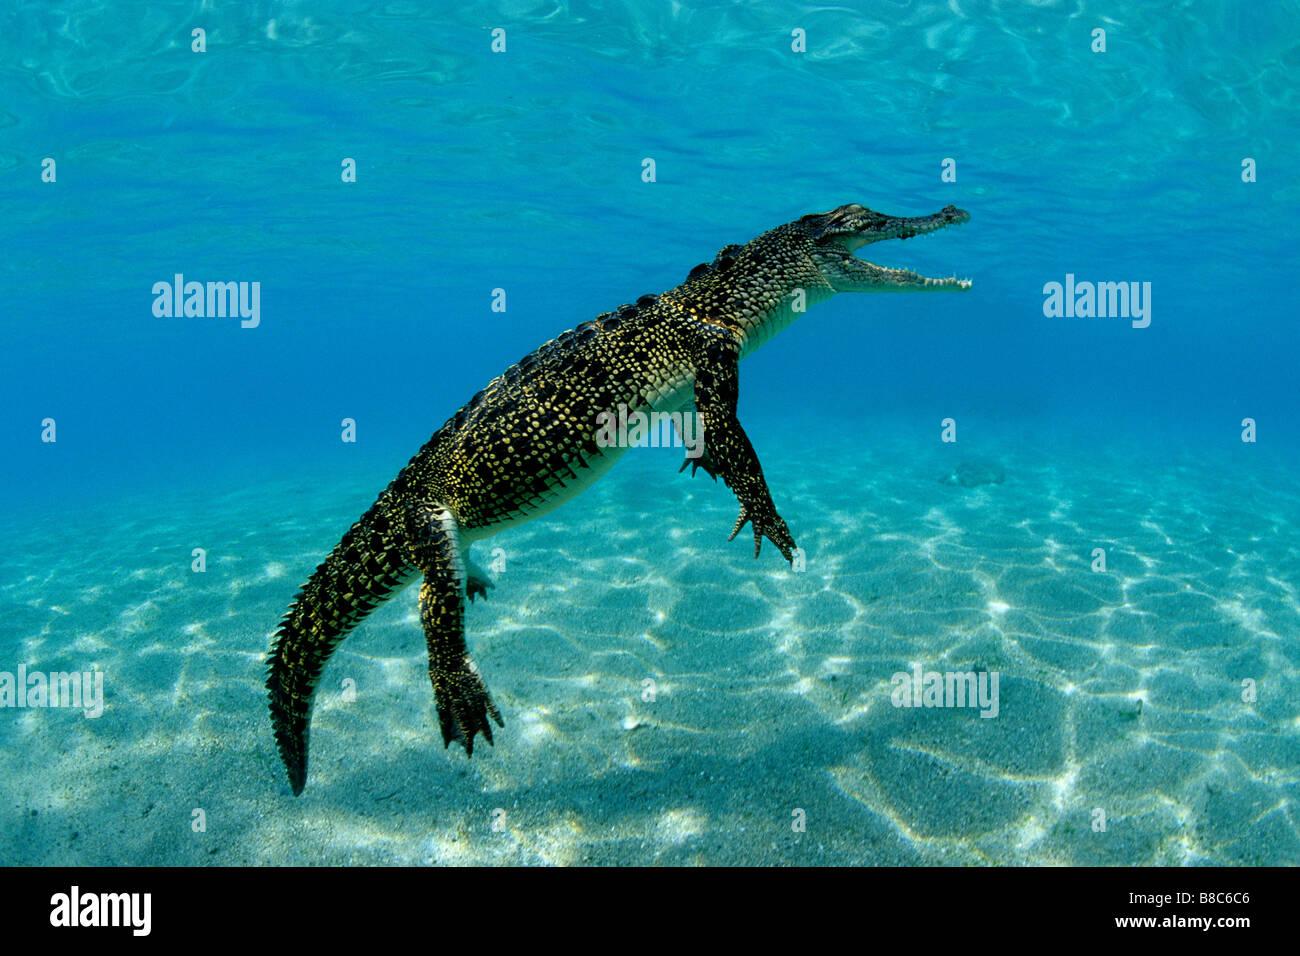 El cocodrilo de agua salada Foto de stock